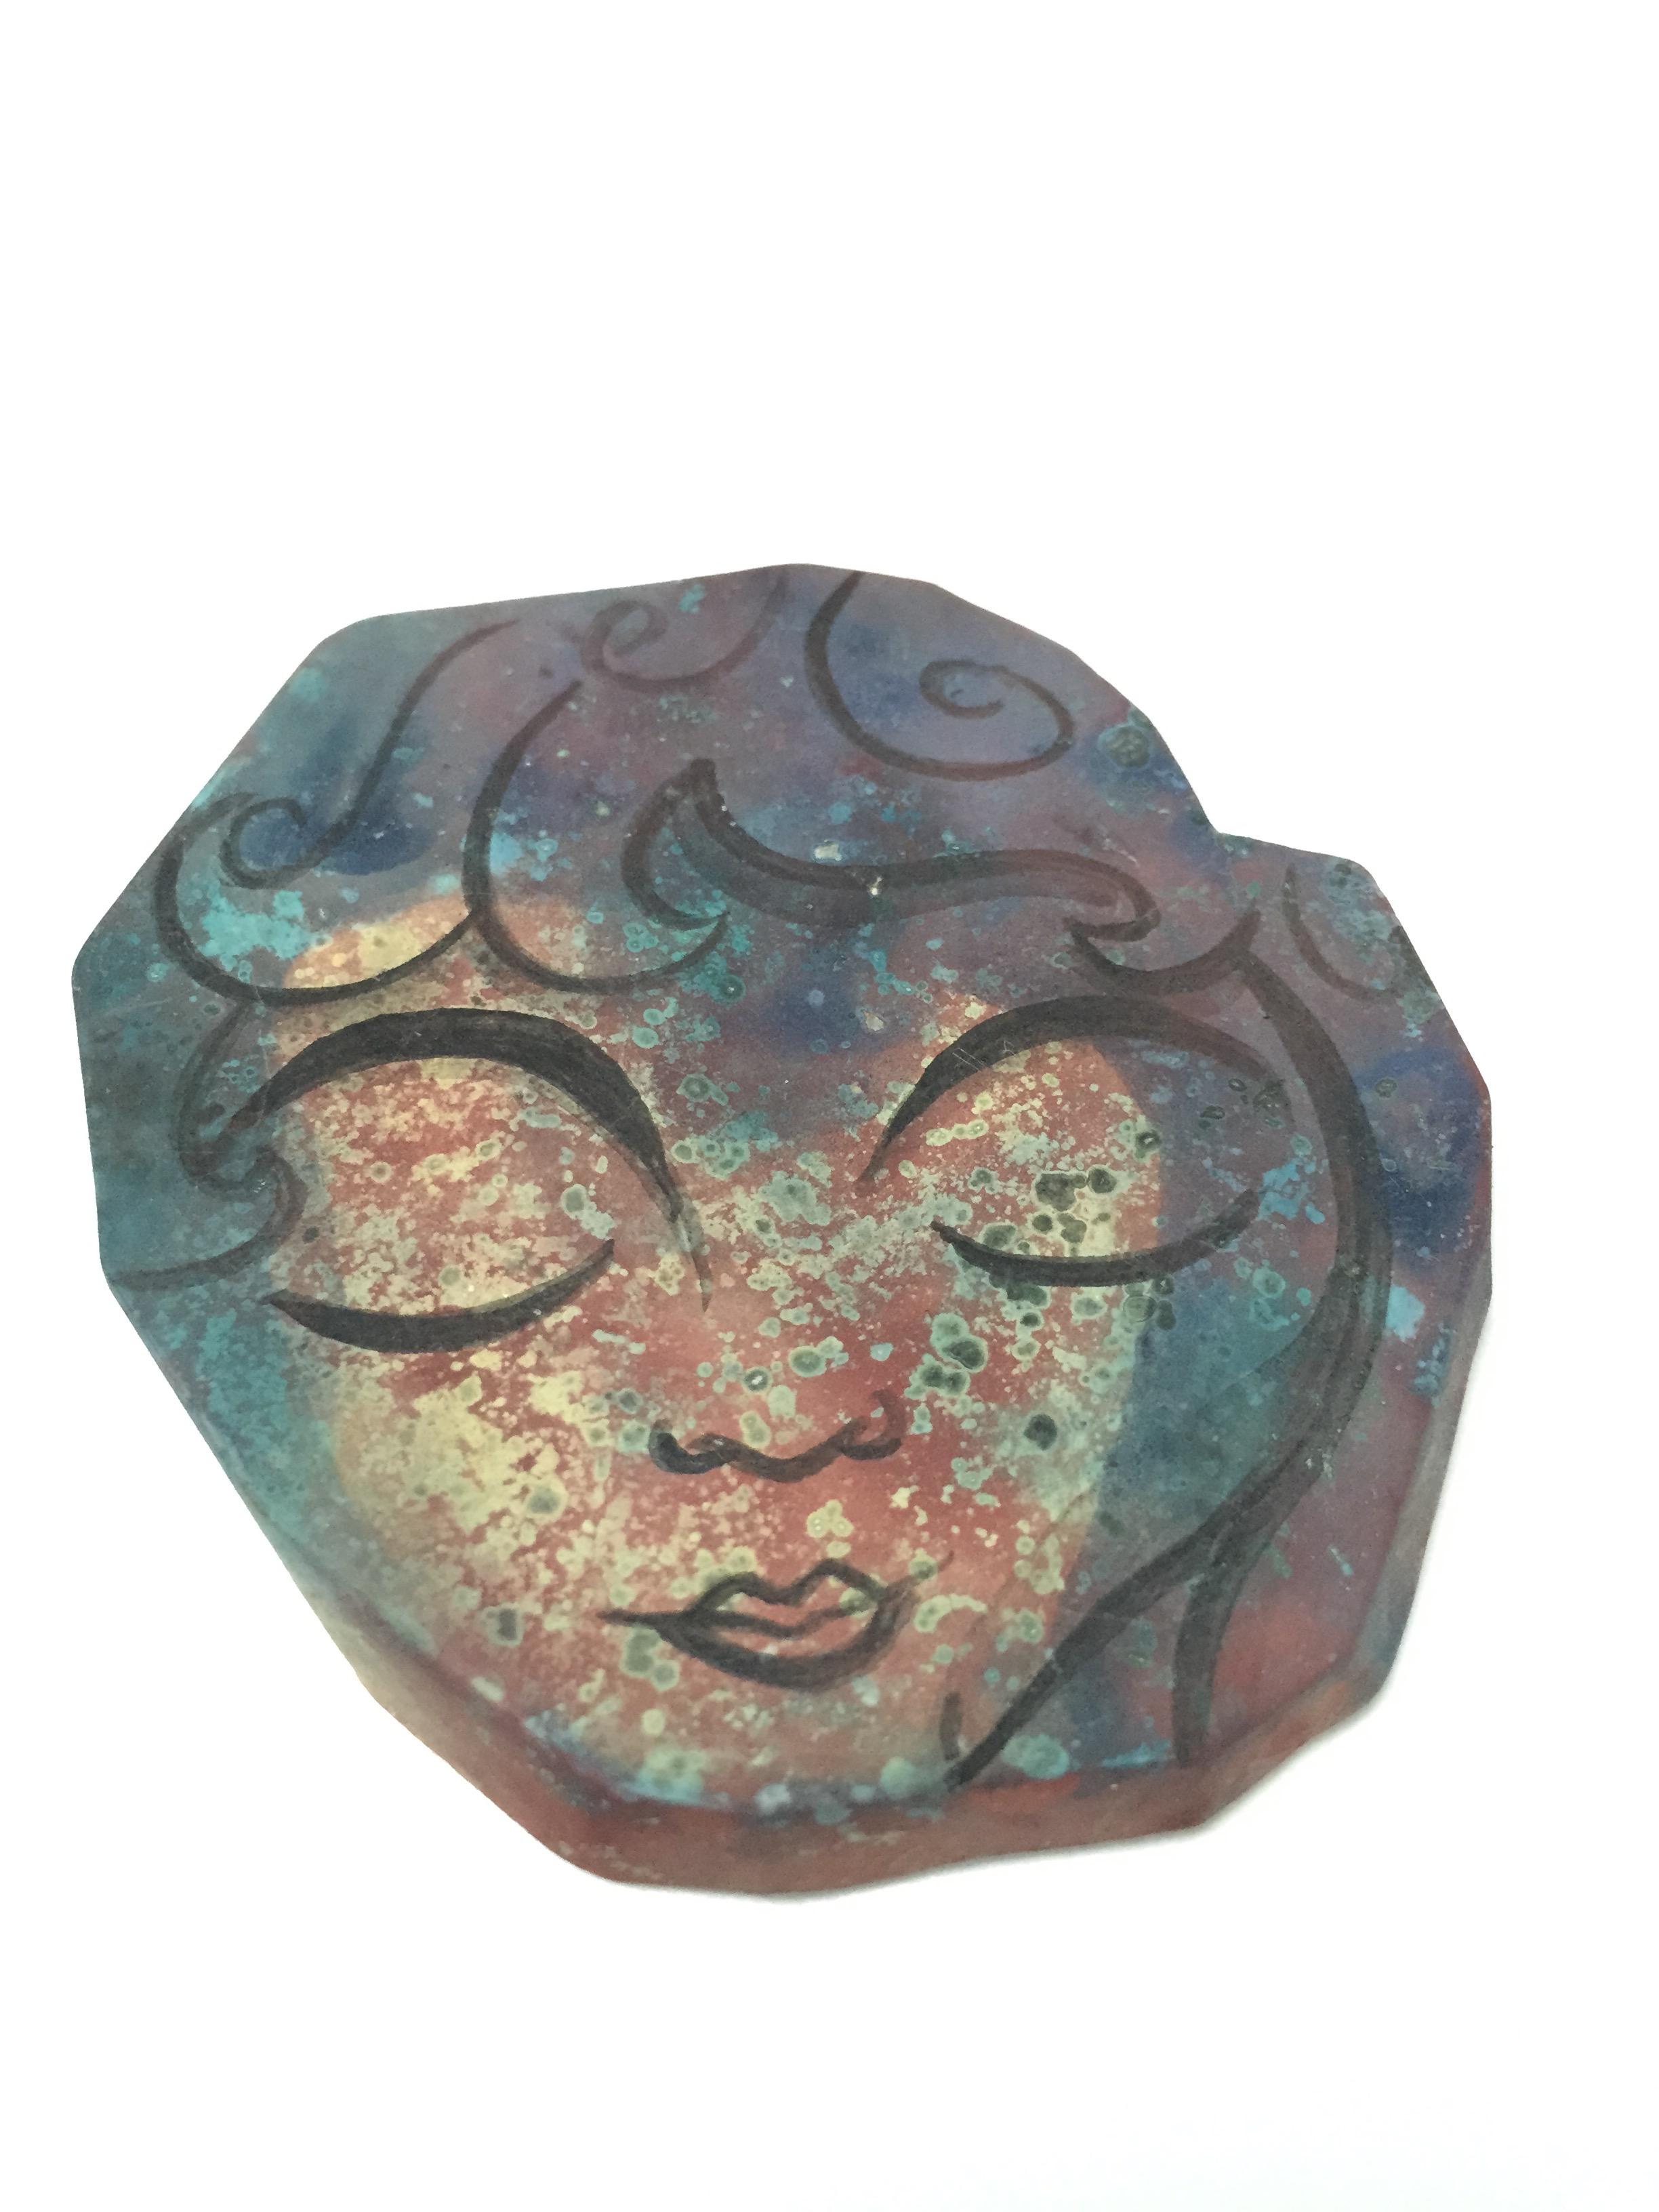 Sheelagh Stone